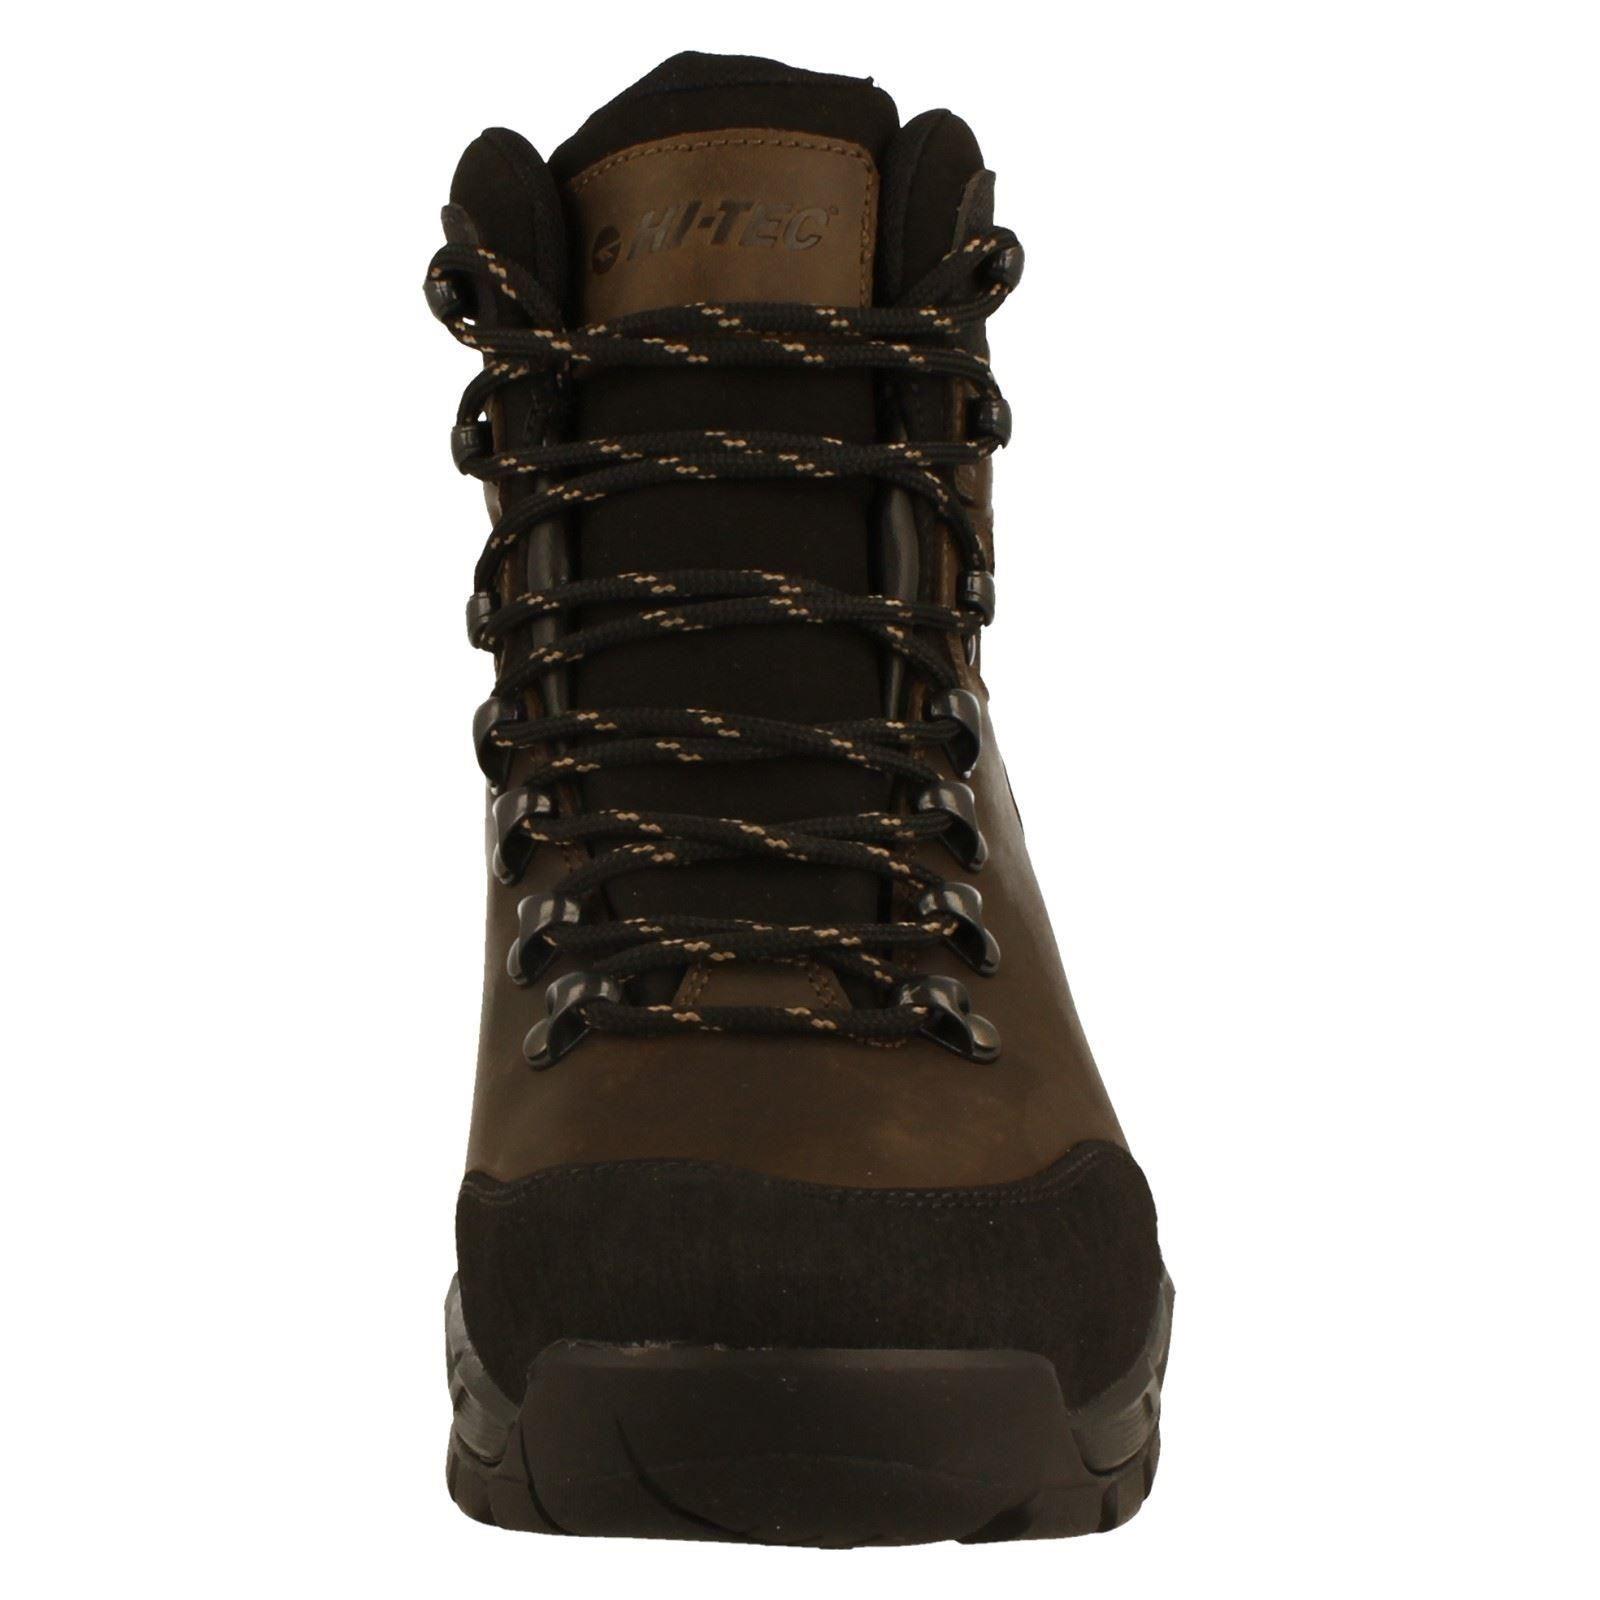 Uomo Style Hi-Tec Walking Stiefel The Style Uomo Altitude PRO RGS WP-W 1f673a